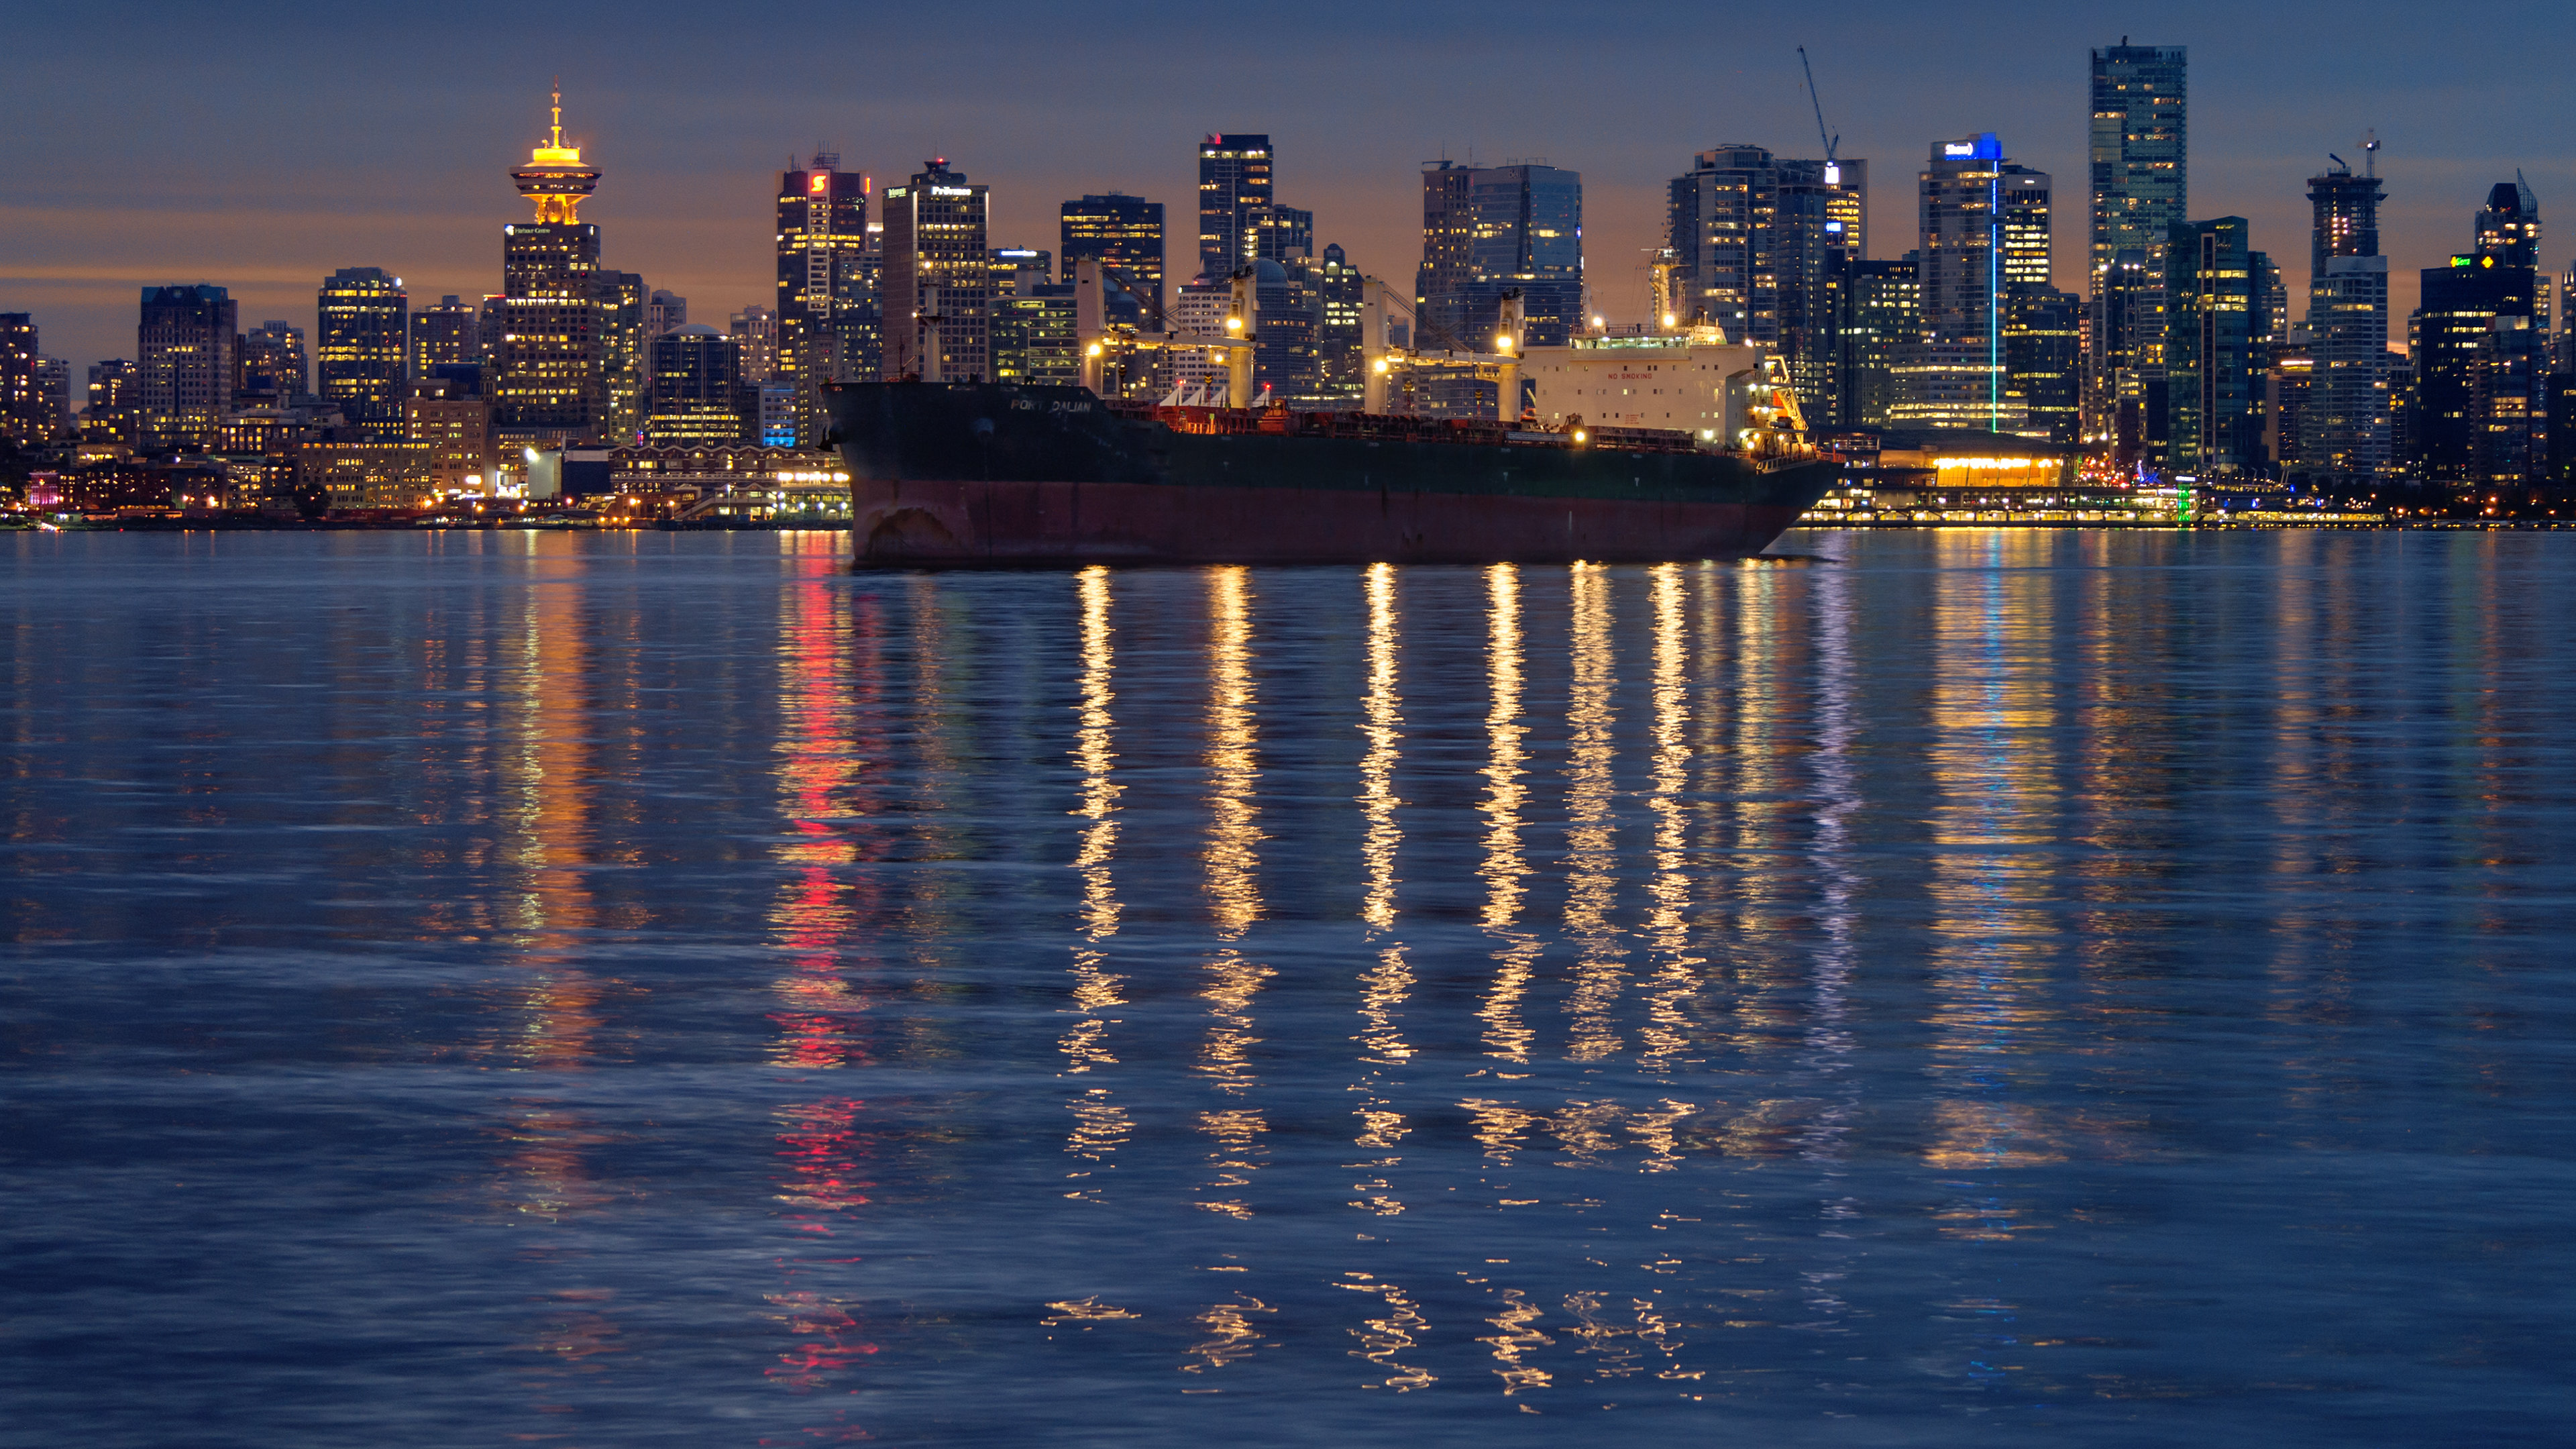 Canada Wallpapers 3840x2160 Ultra HD 4k Desktop Backgrounds